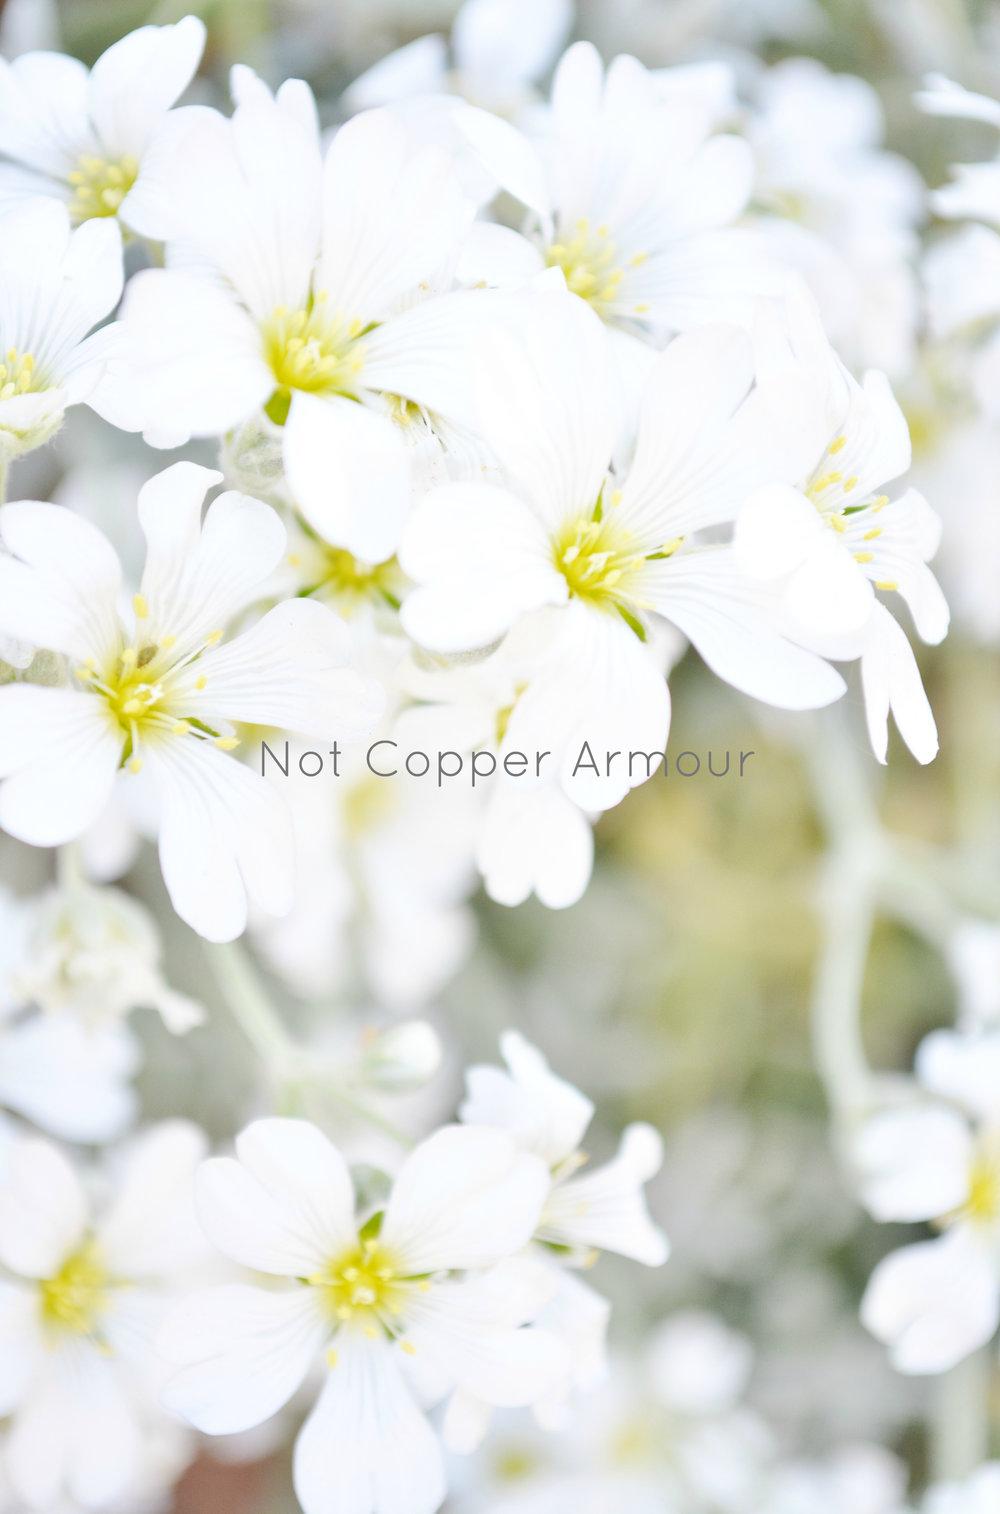 Not Copper Amour - WM #10.jpg